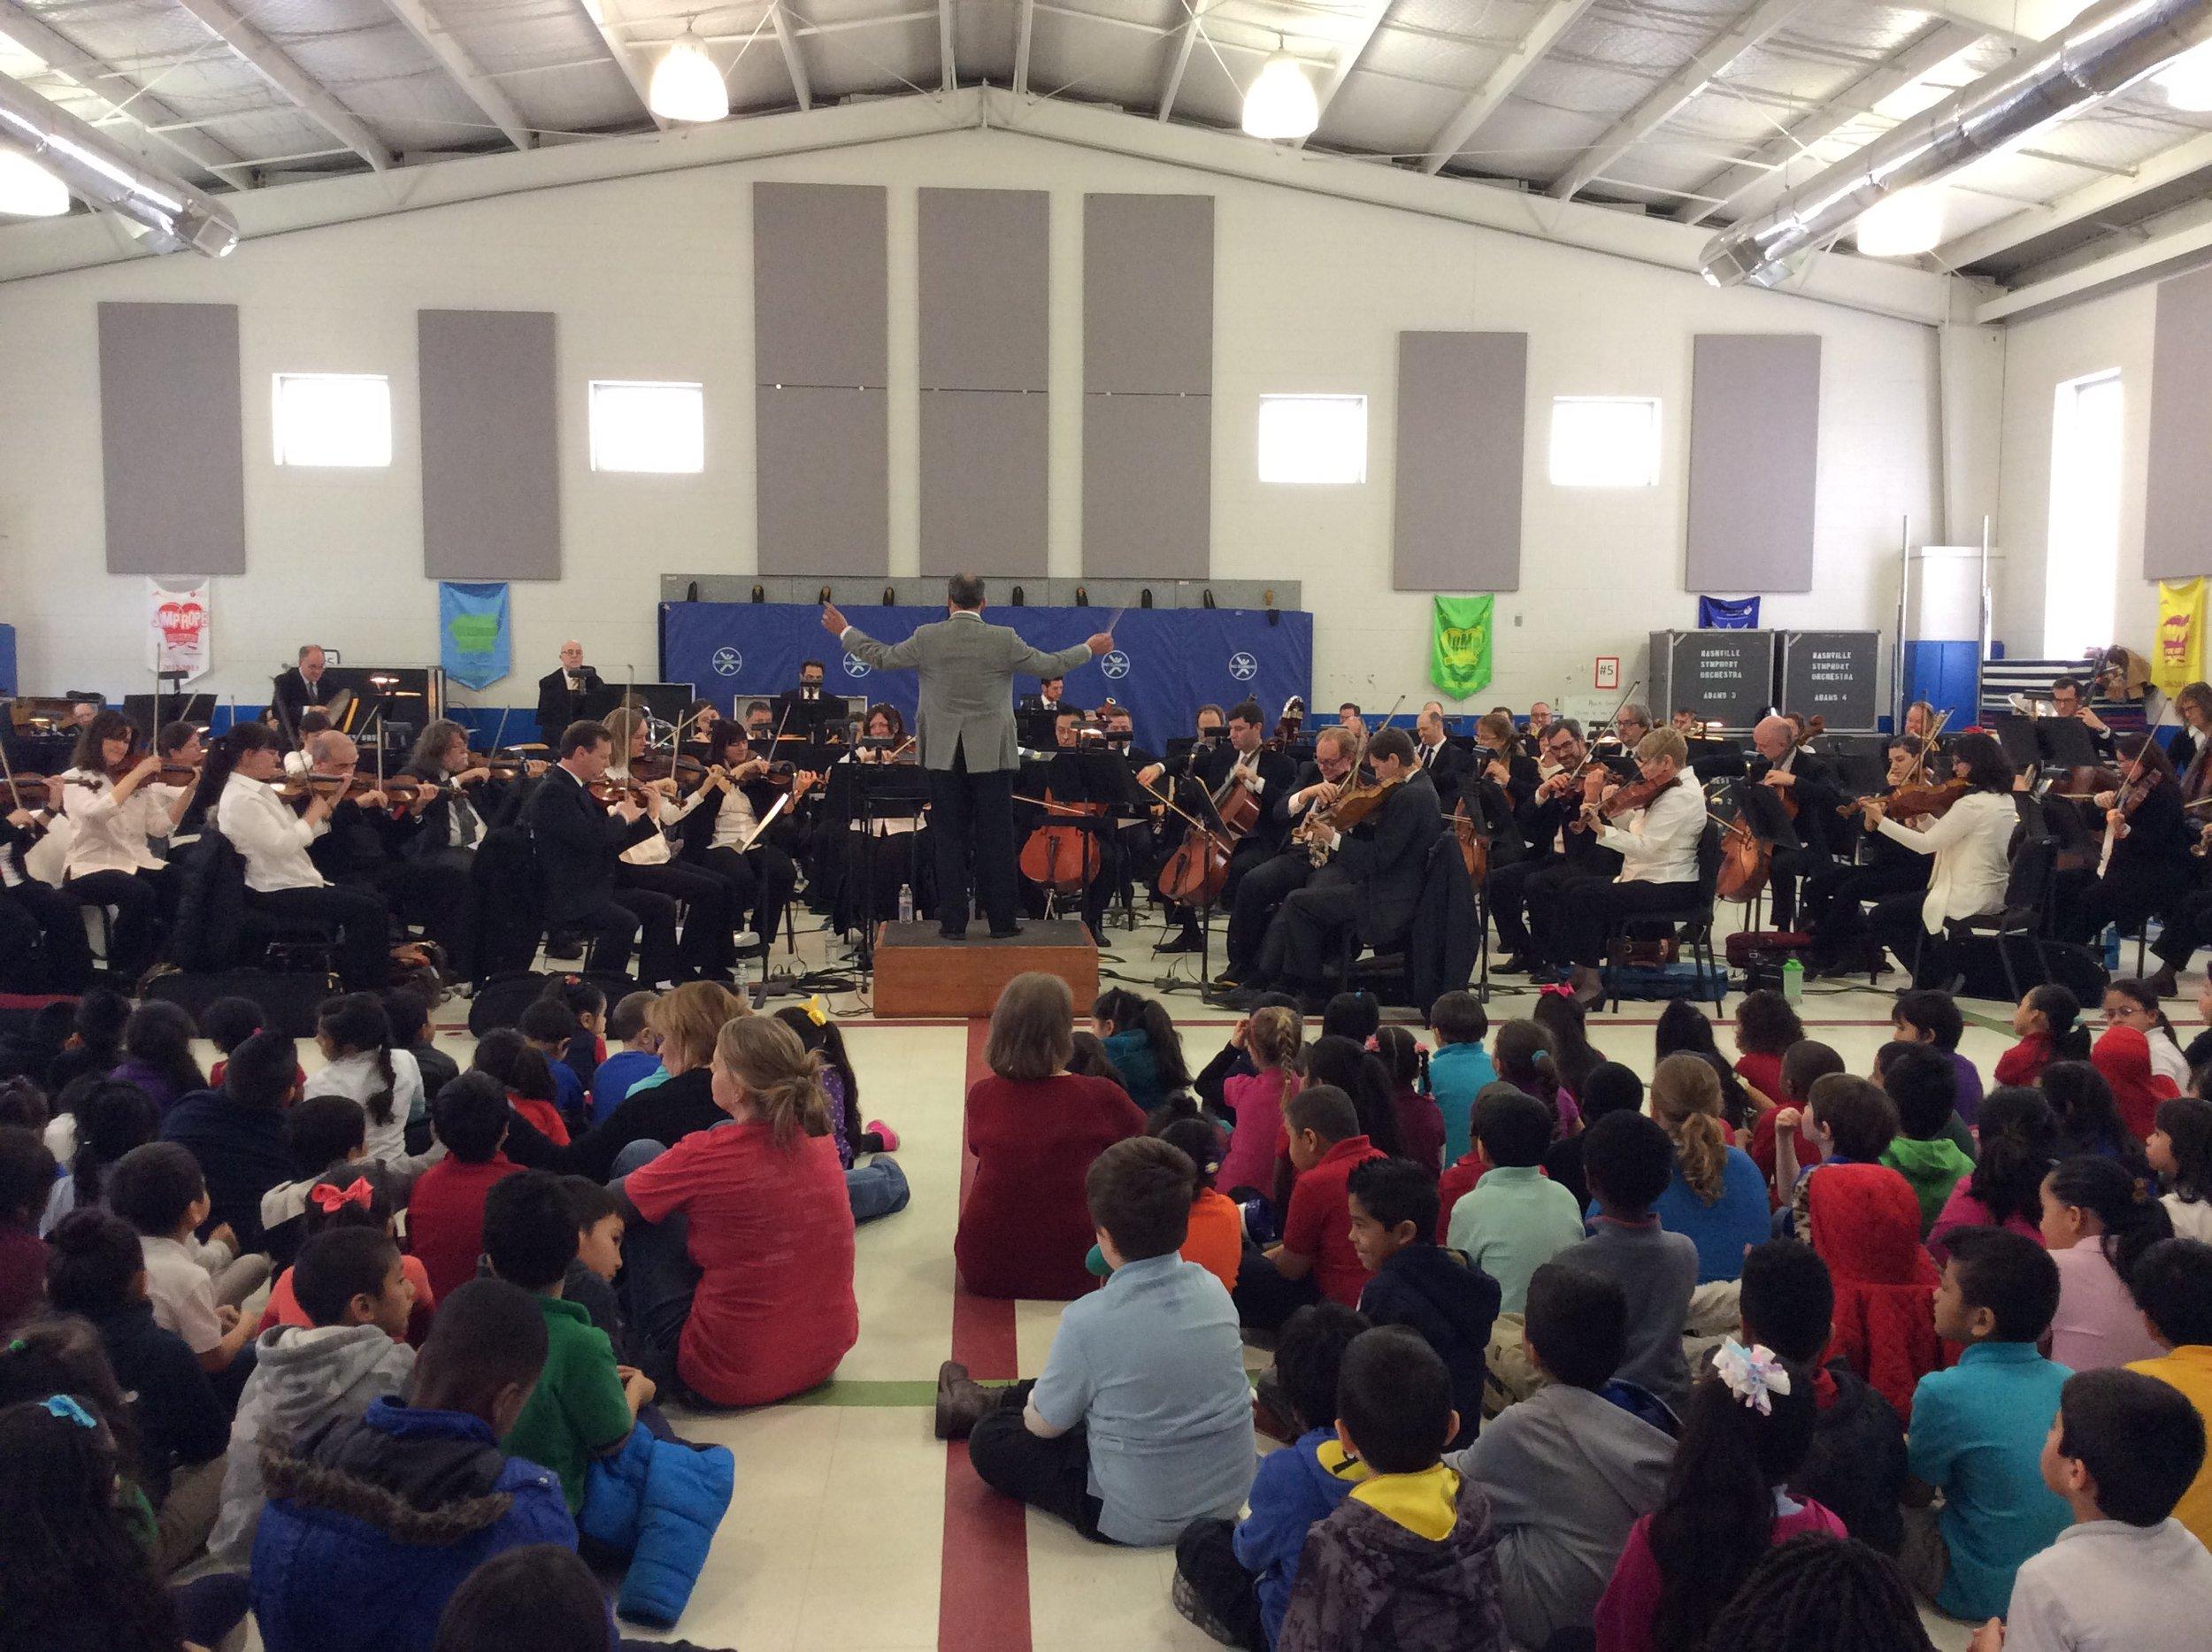 Nashville Symphony Orchestra at JE Moss Elementary February 2016